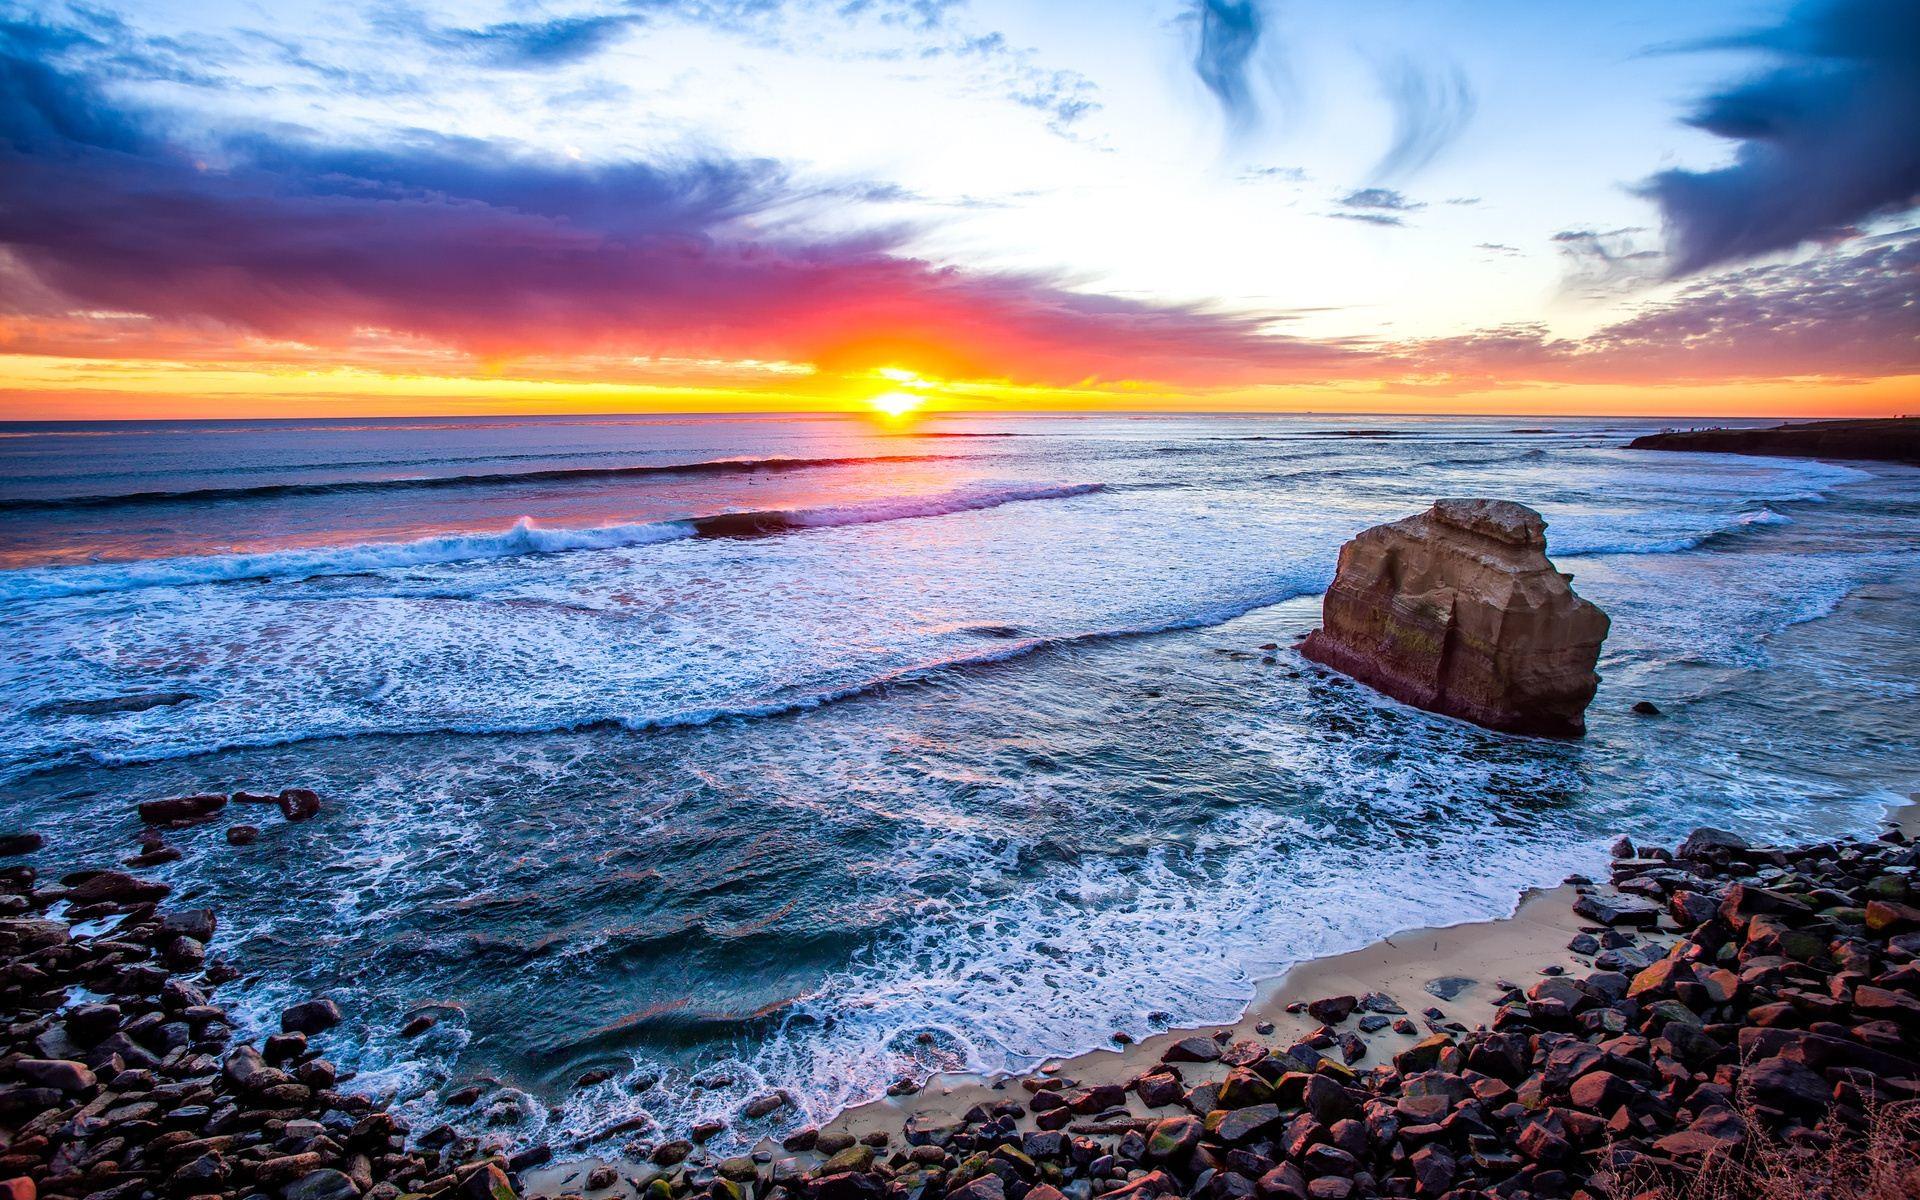 San Diego Beach Sunset HD Wallpapers